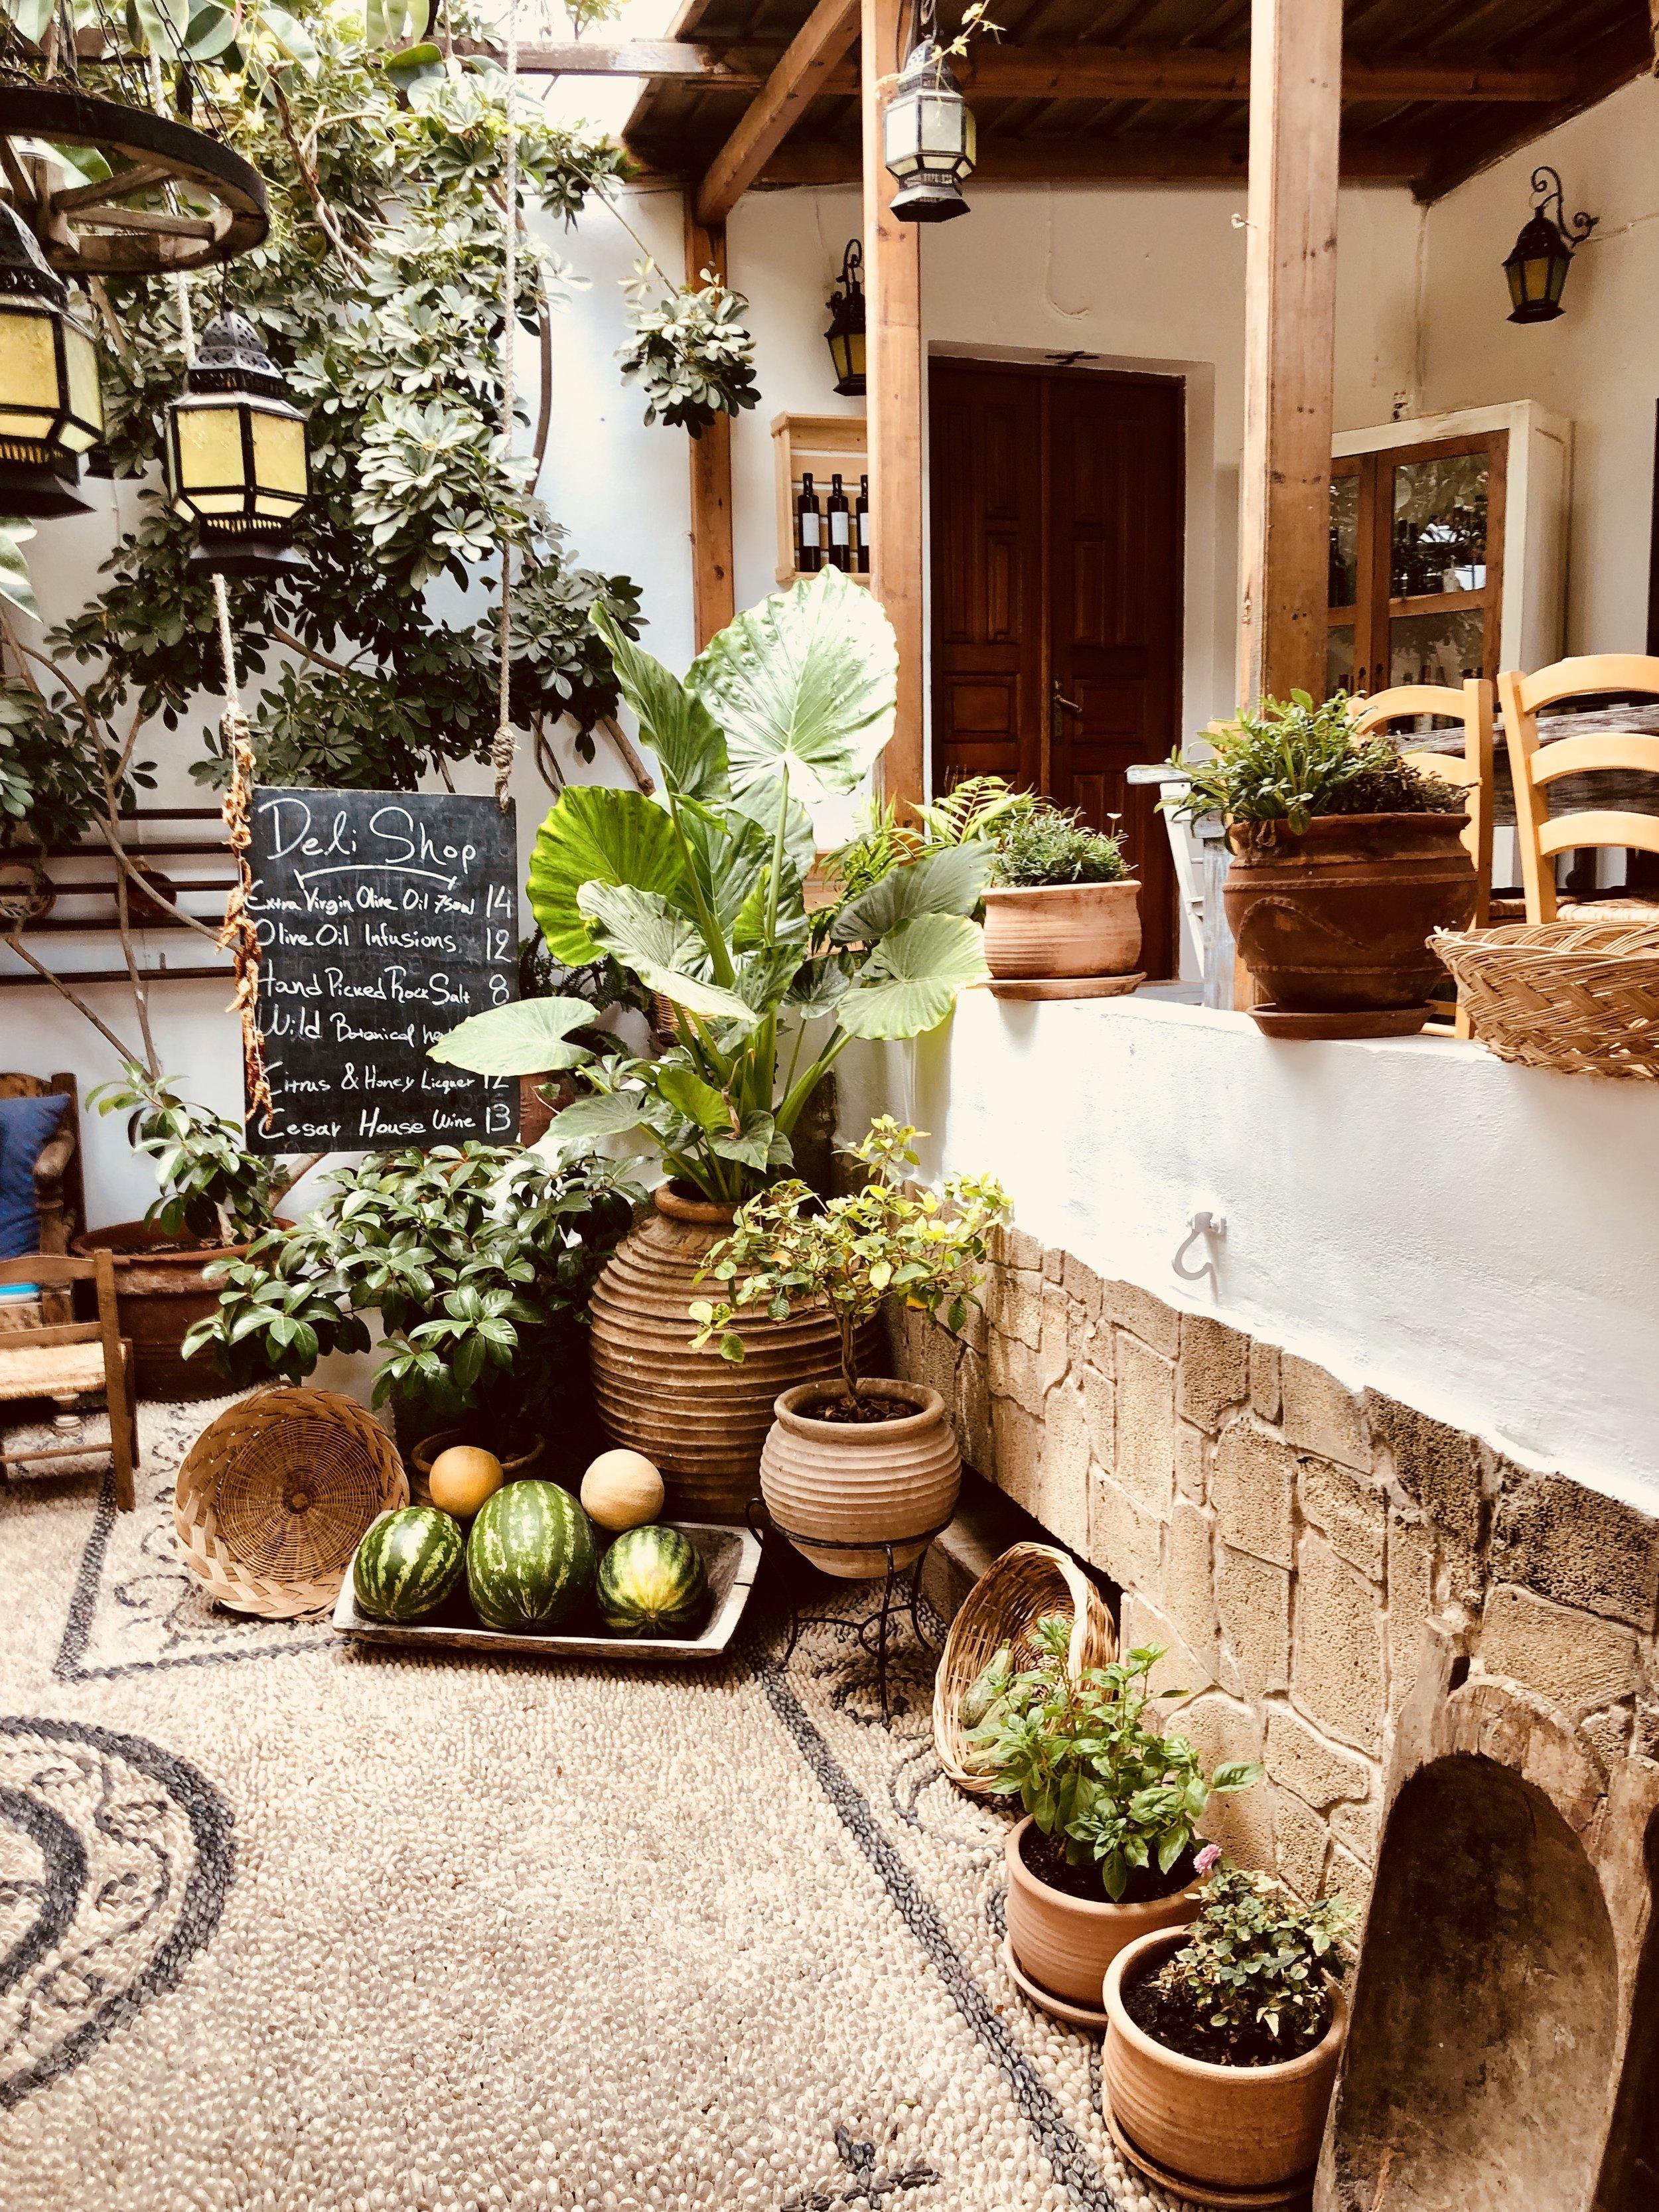 The market place - Rhodes, Greece